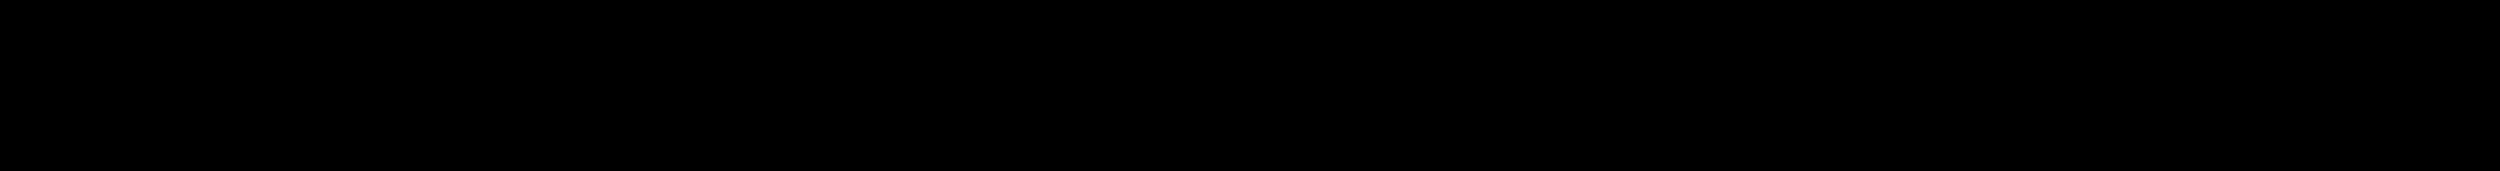 Farahourani_Logo